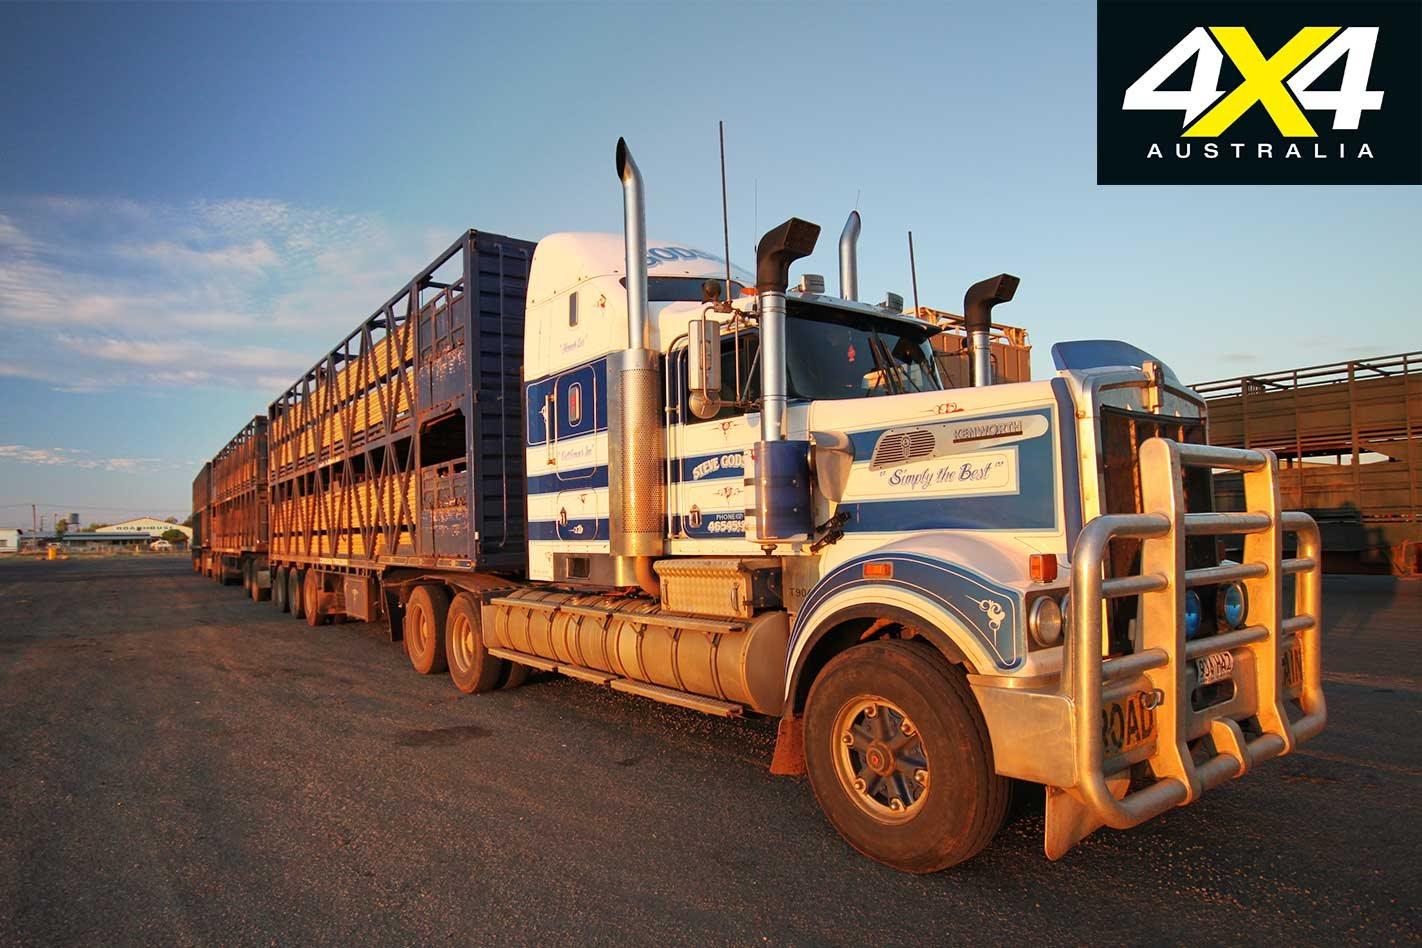 43644522951 4x4 road trip on the Matilda Highway